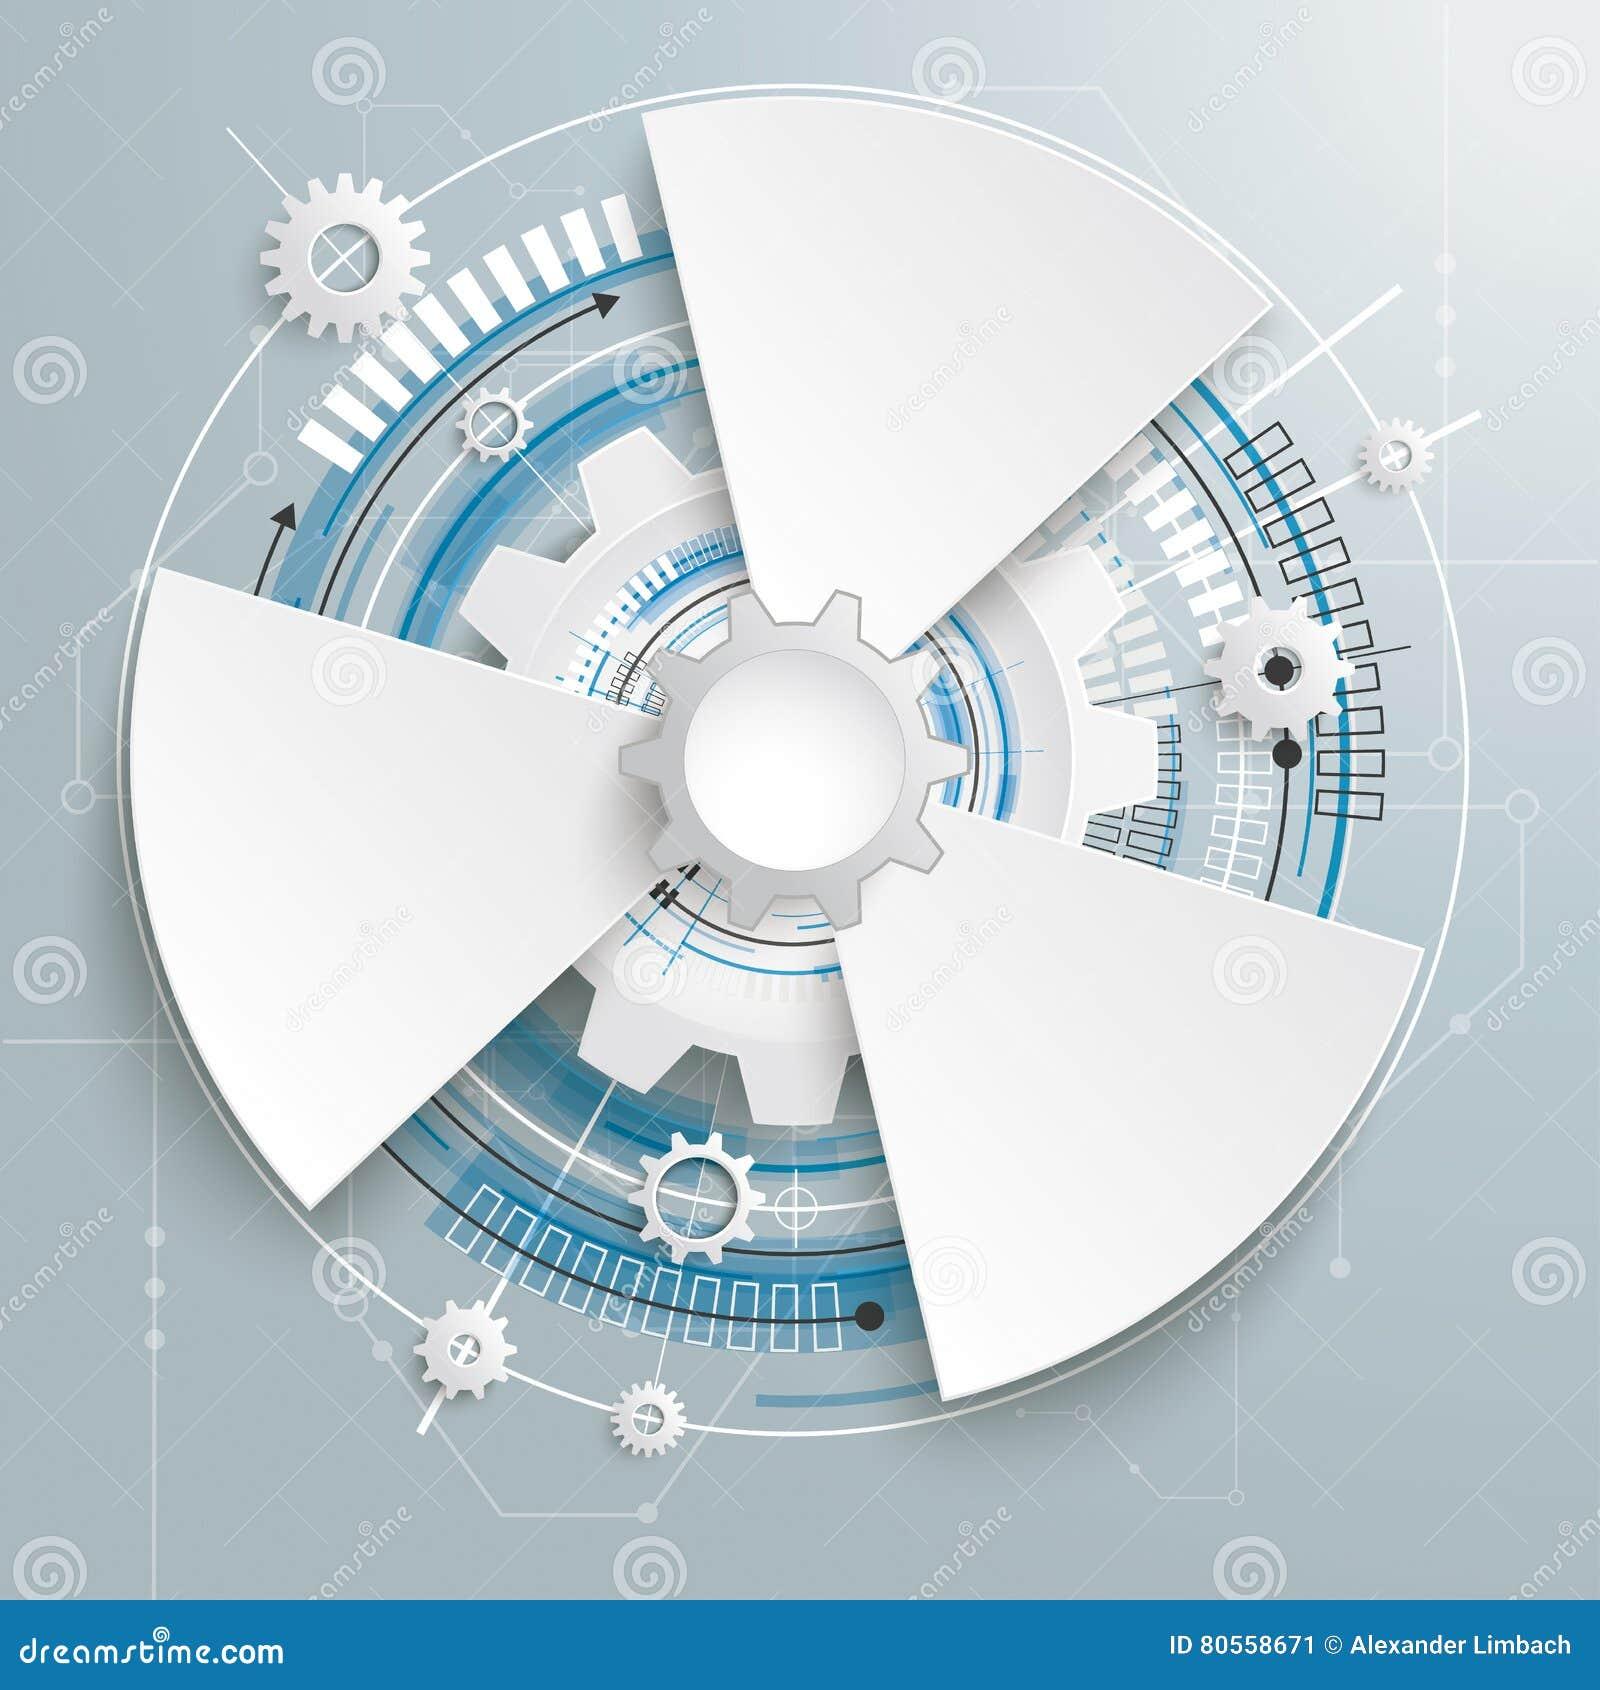 Futuristic Gear Construction Circuit Board 3 Options Stock Vector ...